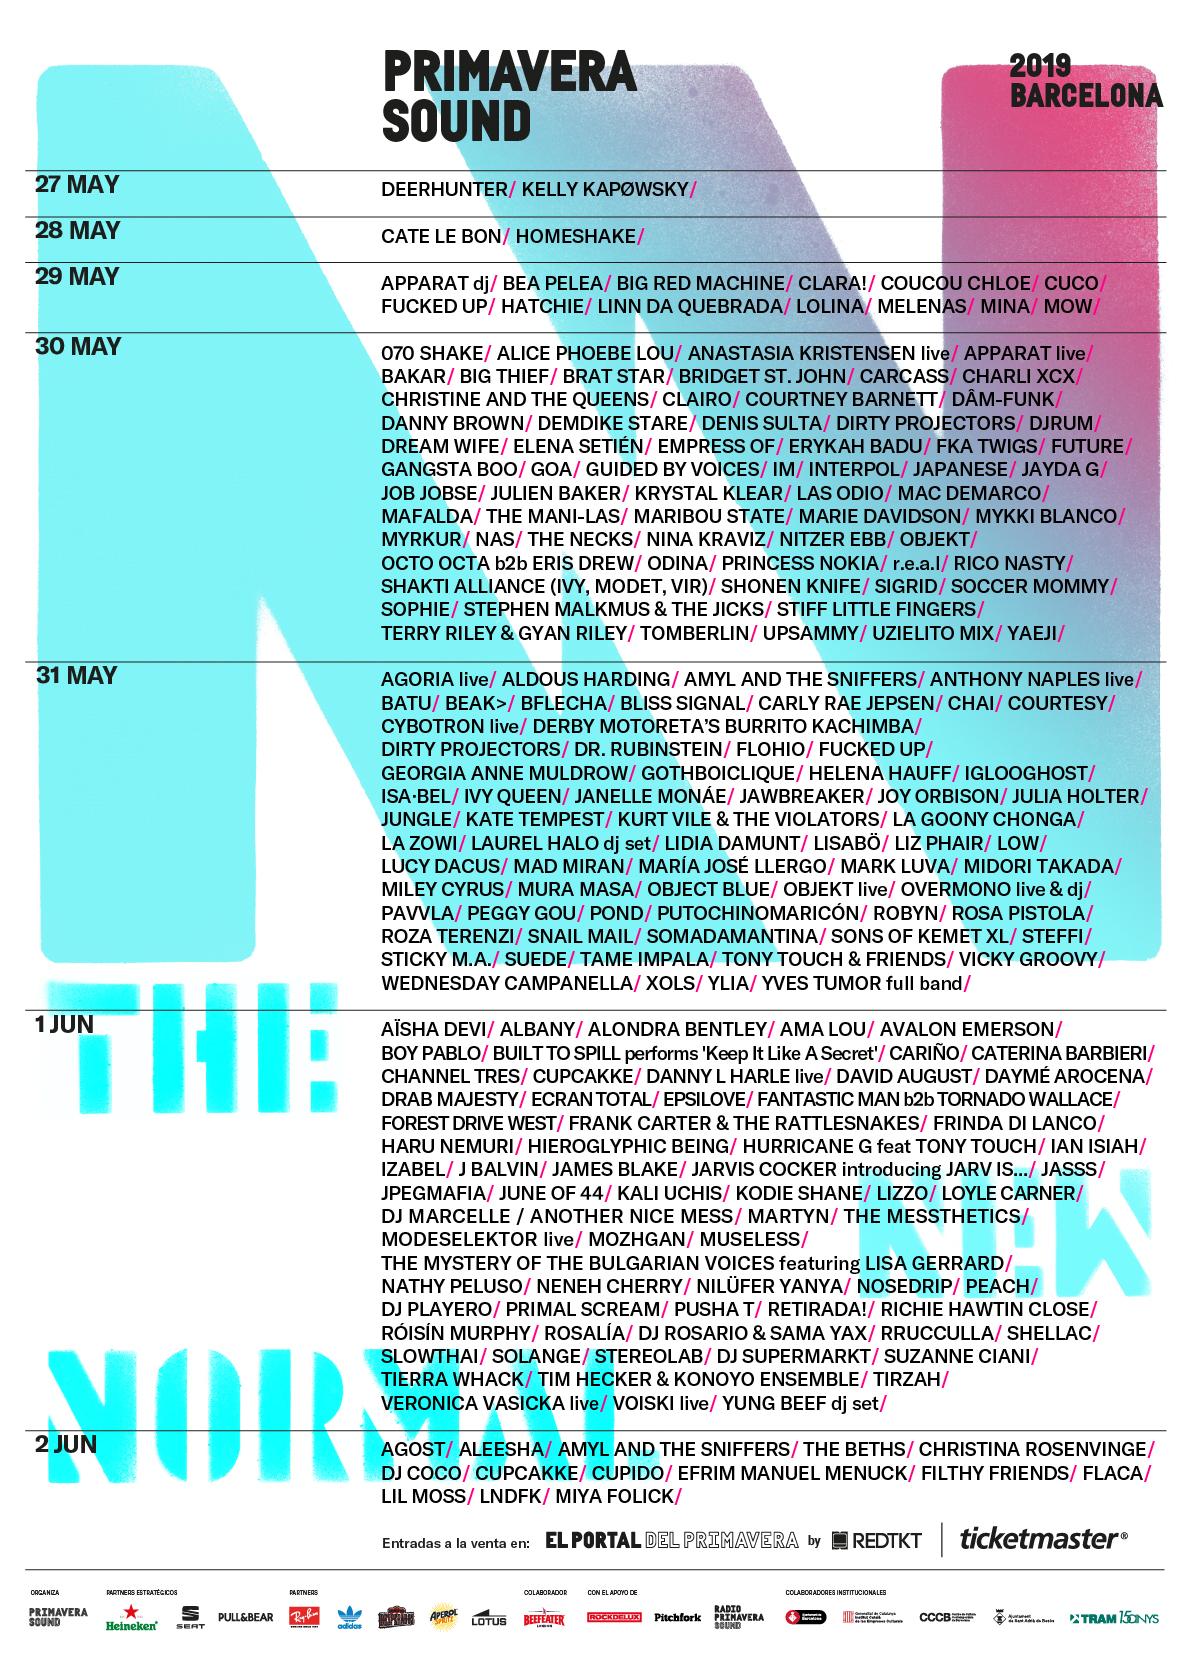 Primavera Sound poster 2019 lineup cartel